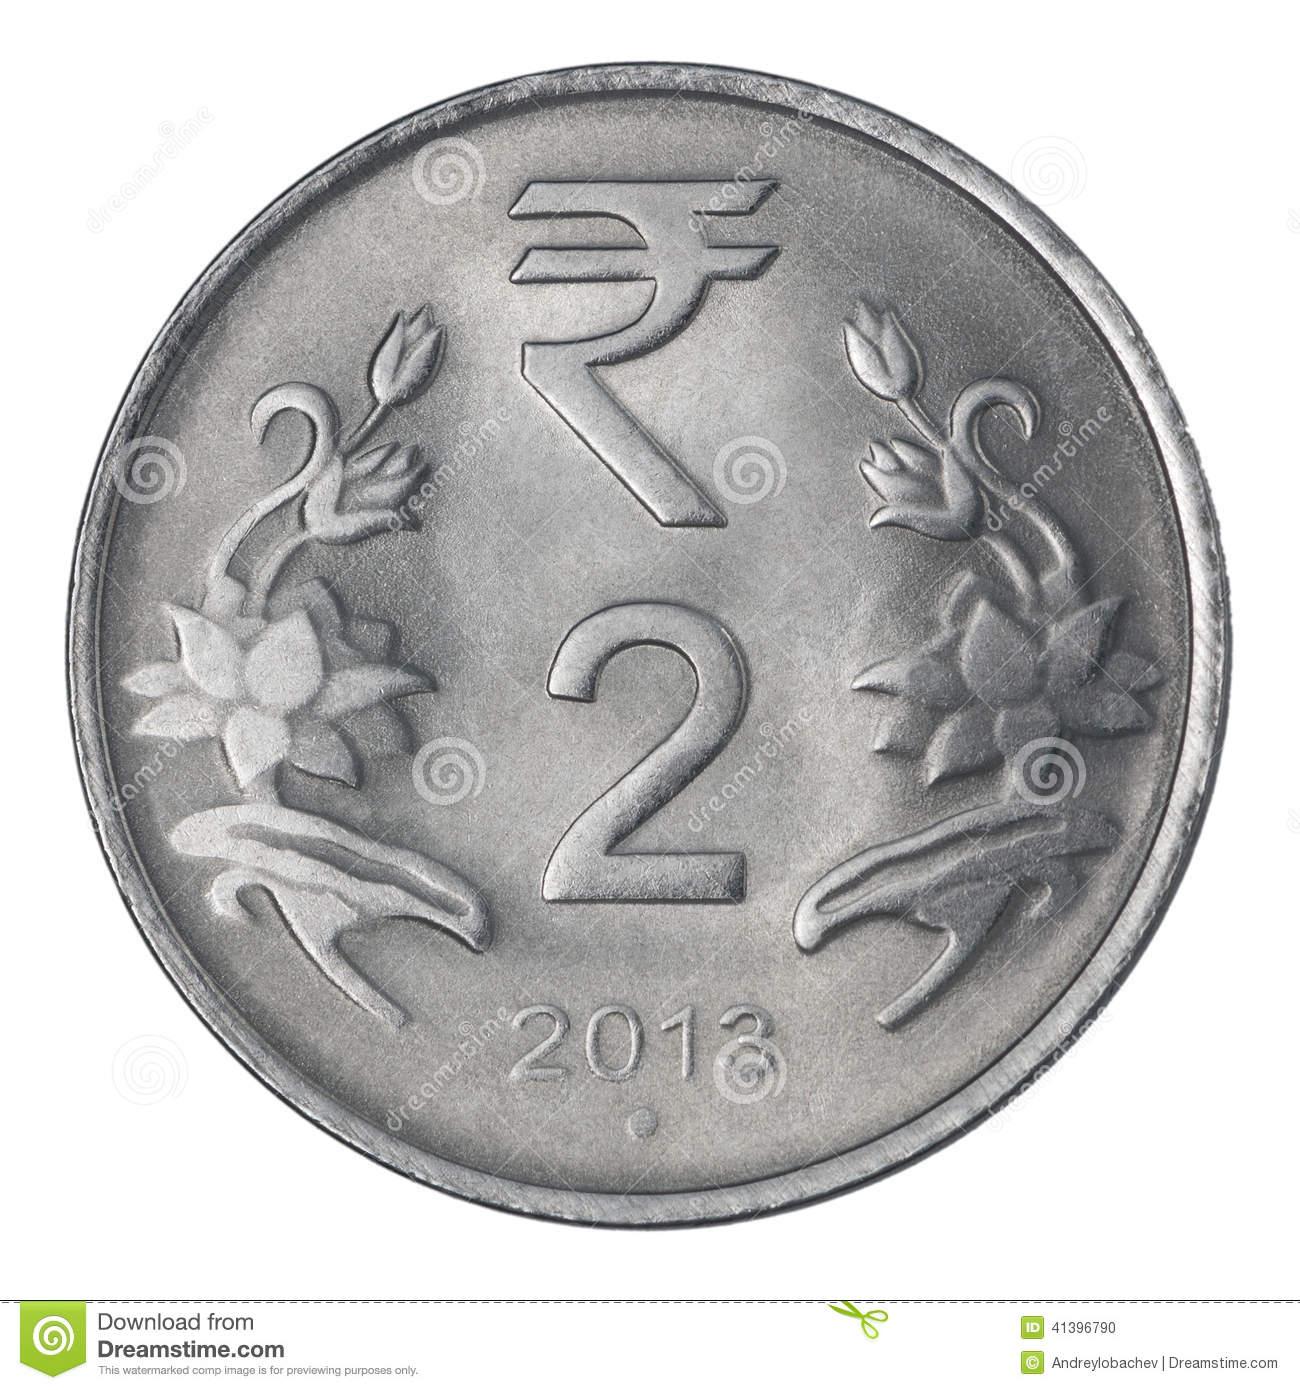 2 Rupee Coin Clipart.